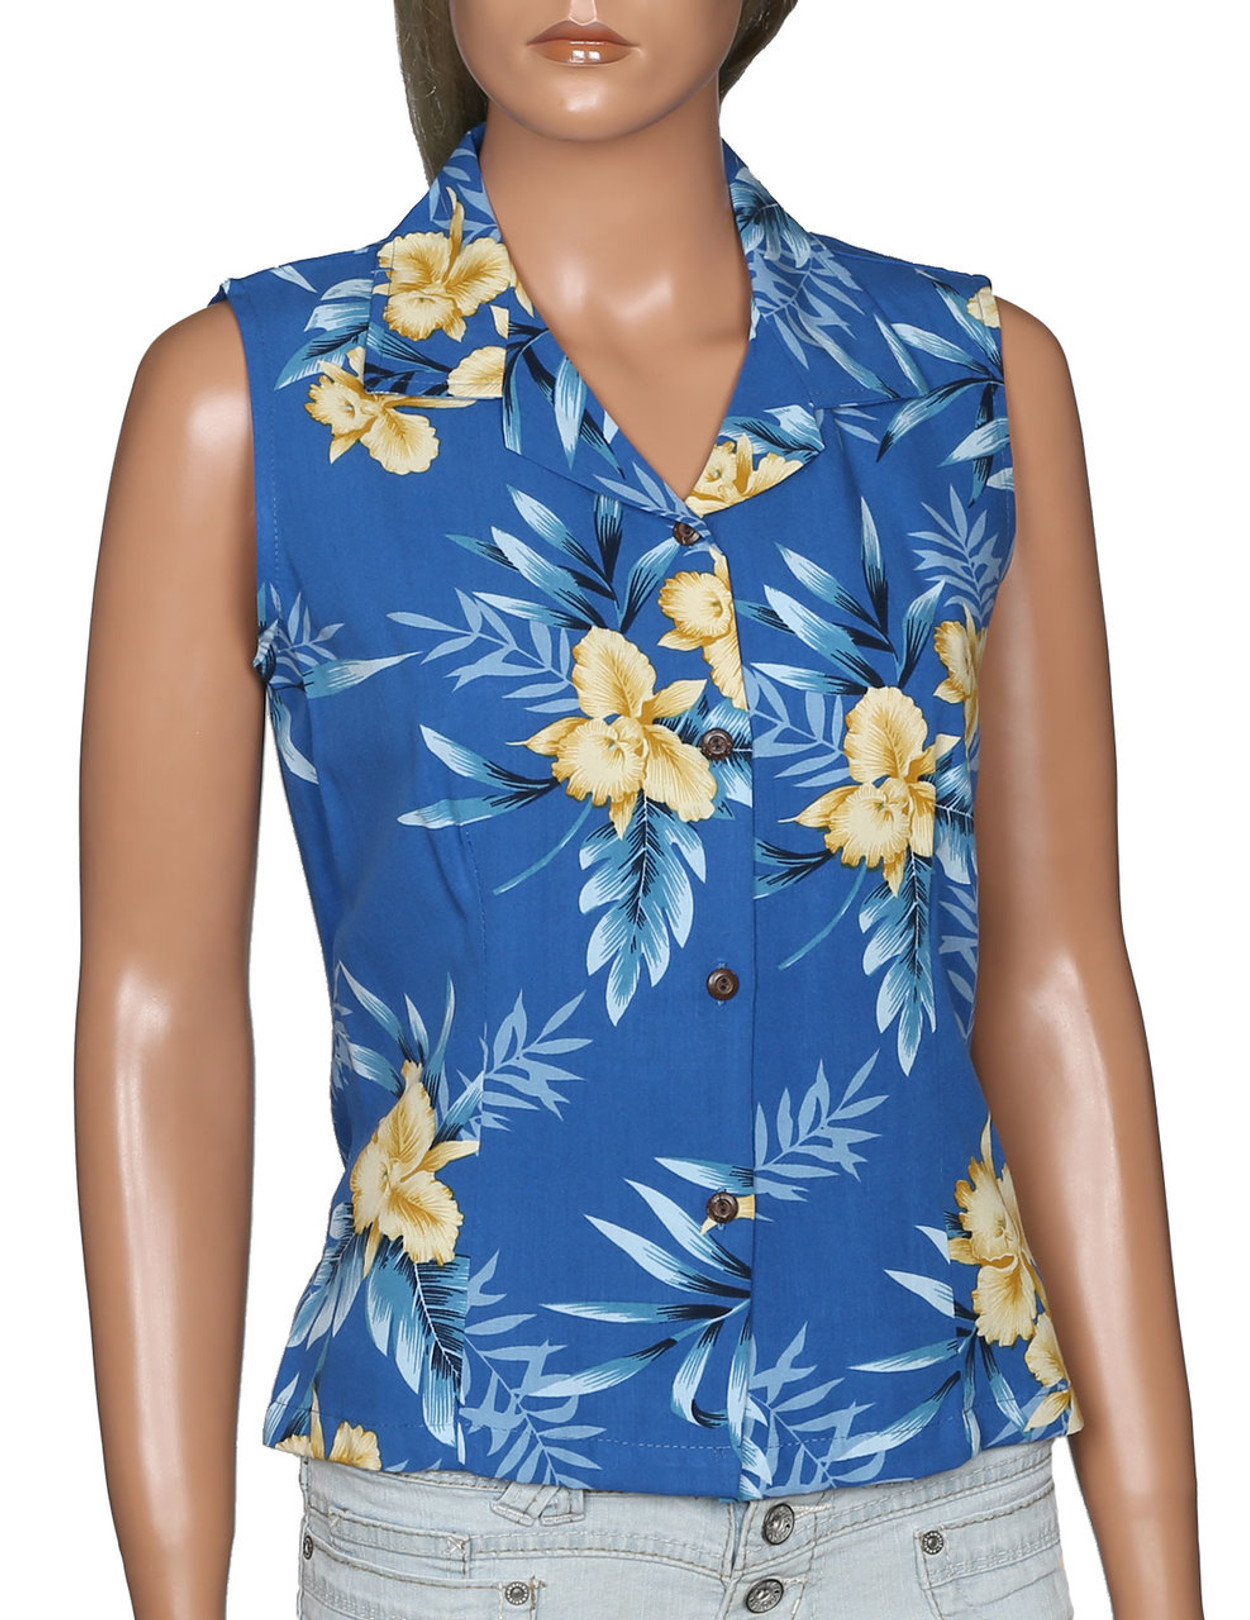 ad363586b0f5c Okalani Aloha Sleeveless Blouse - Hawaiian Wedding Place